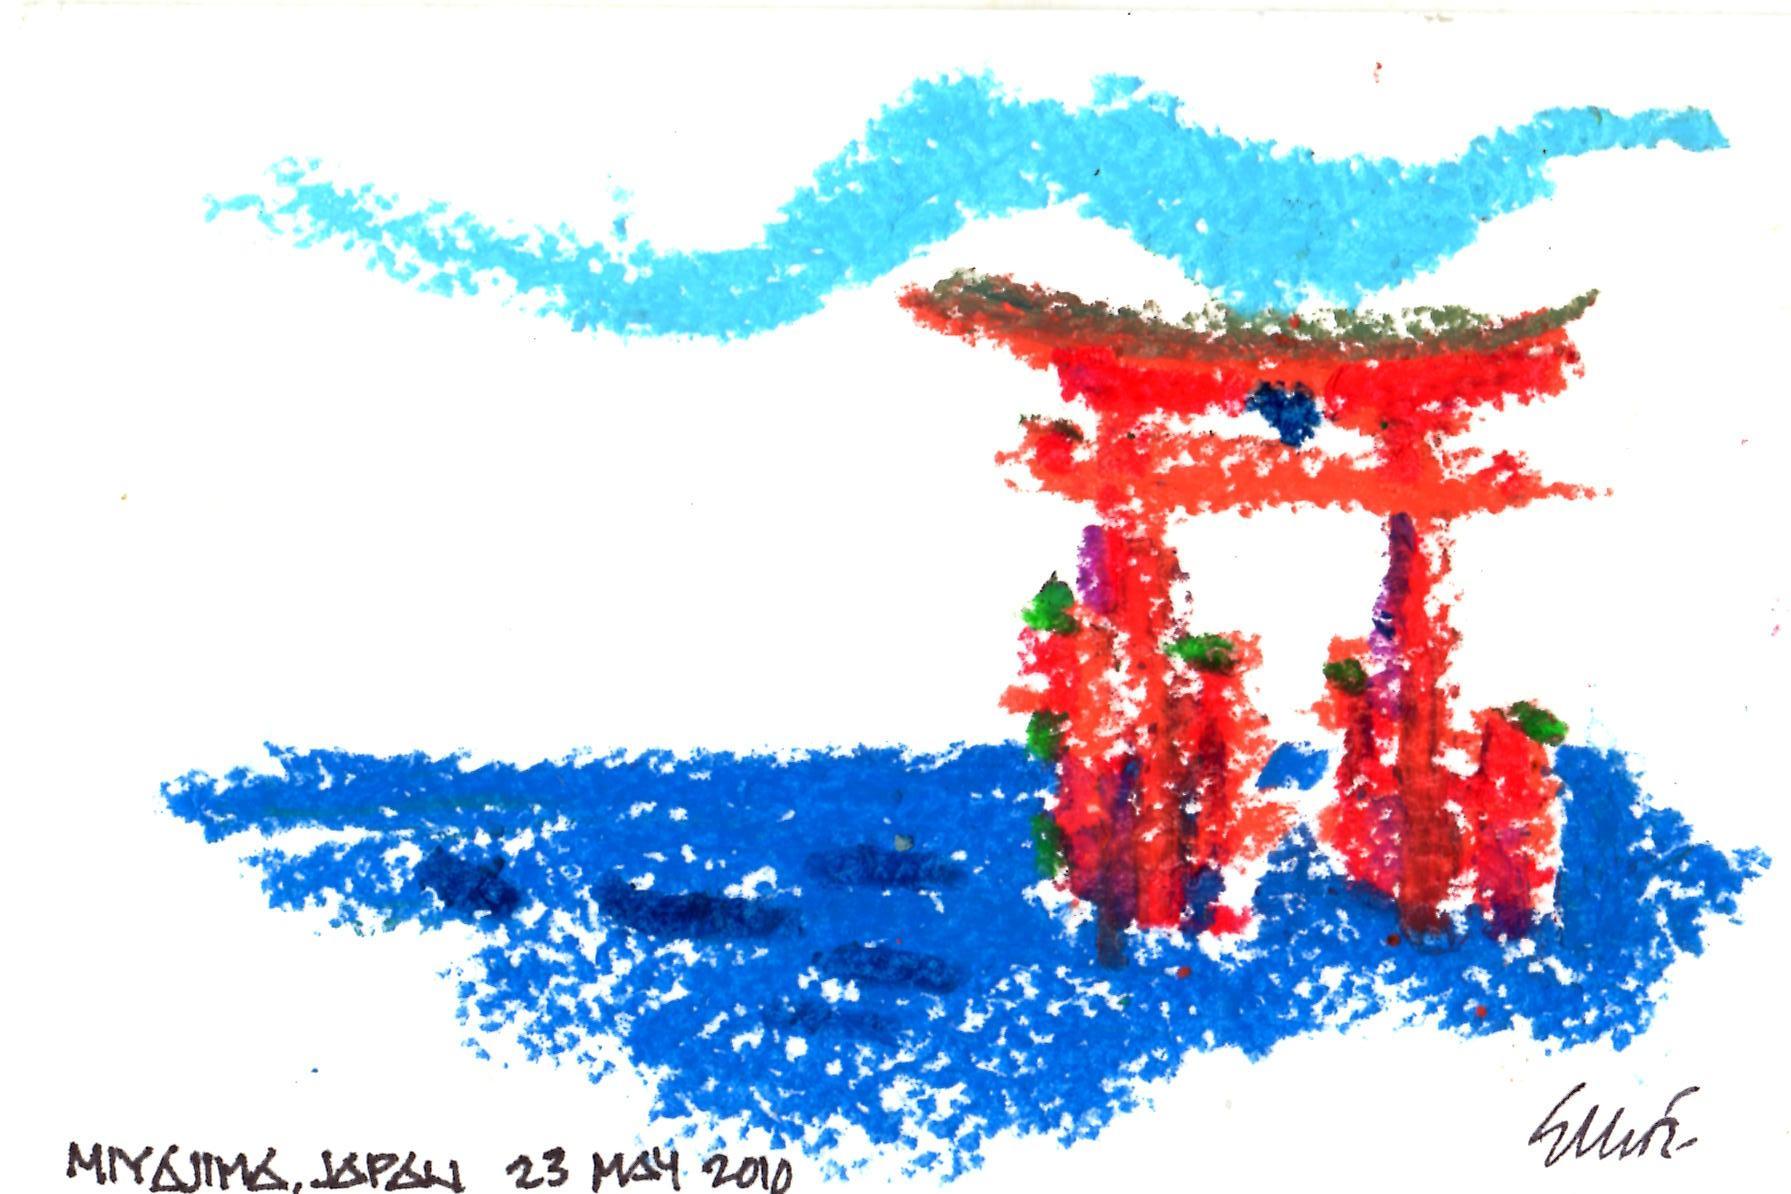 Torii Gate of Itsukushima Shrine Miyajima